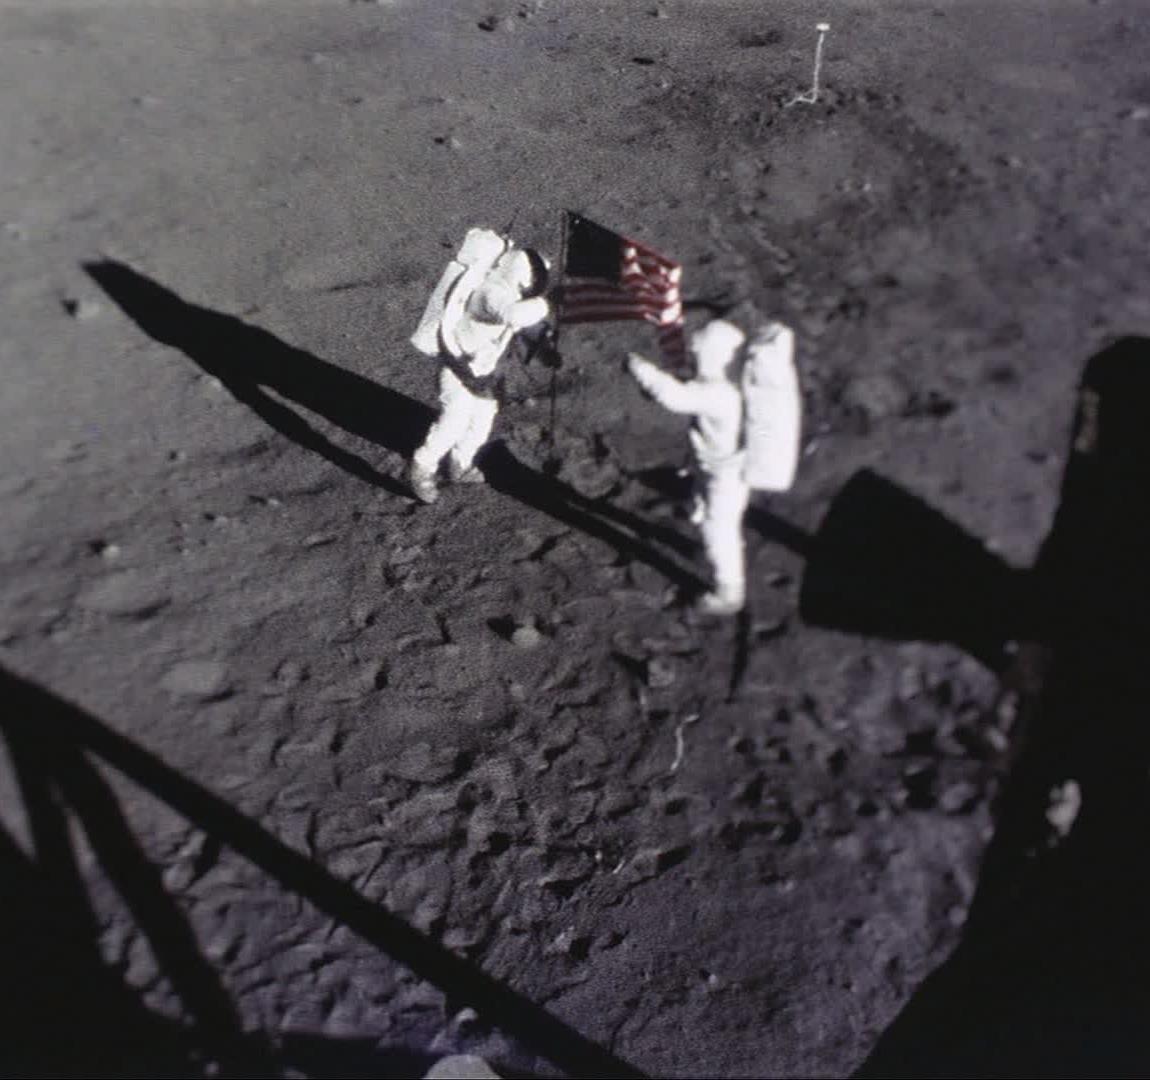 Stanley Kubrick fake moon landing conspiracy theory just won